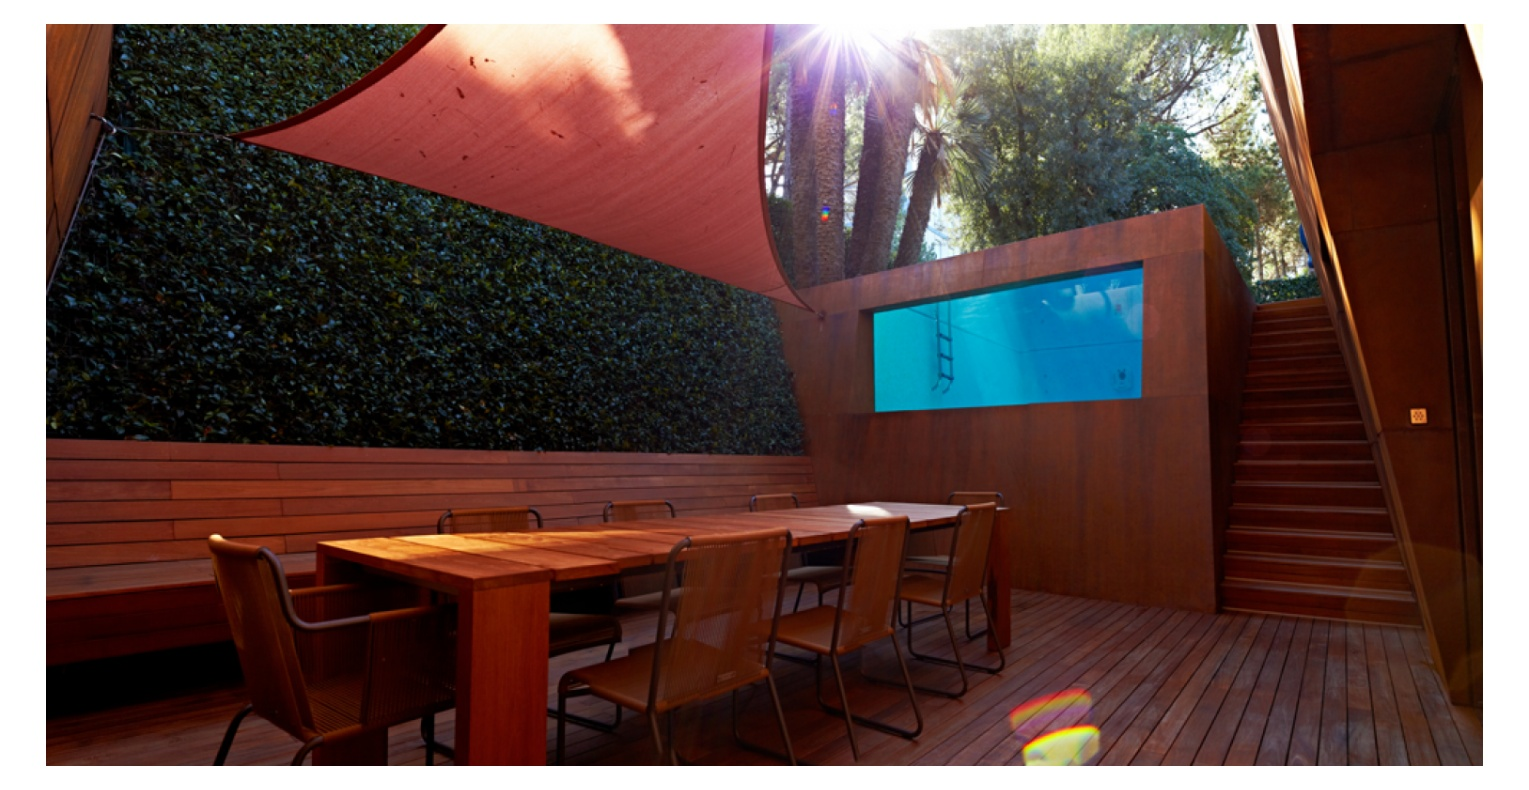 Casa H2O - Lignano Sabbiadoro (UD)  - Arch. L. Pollini